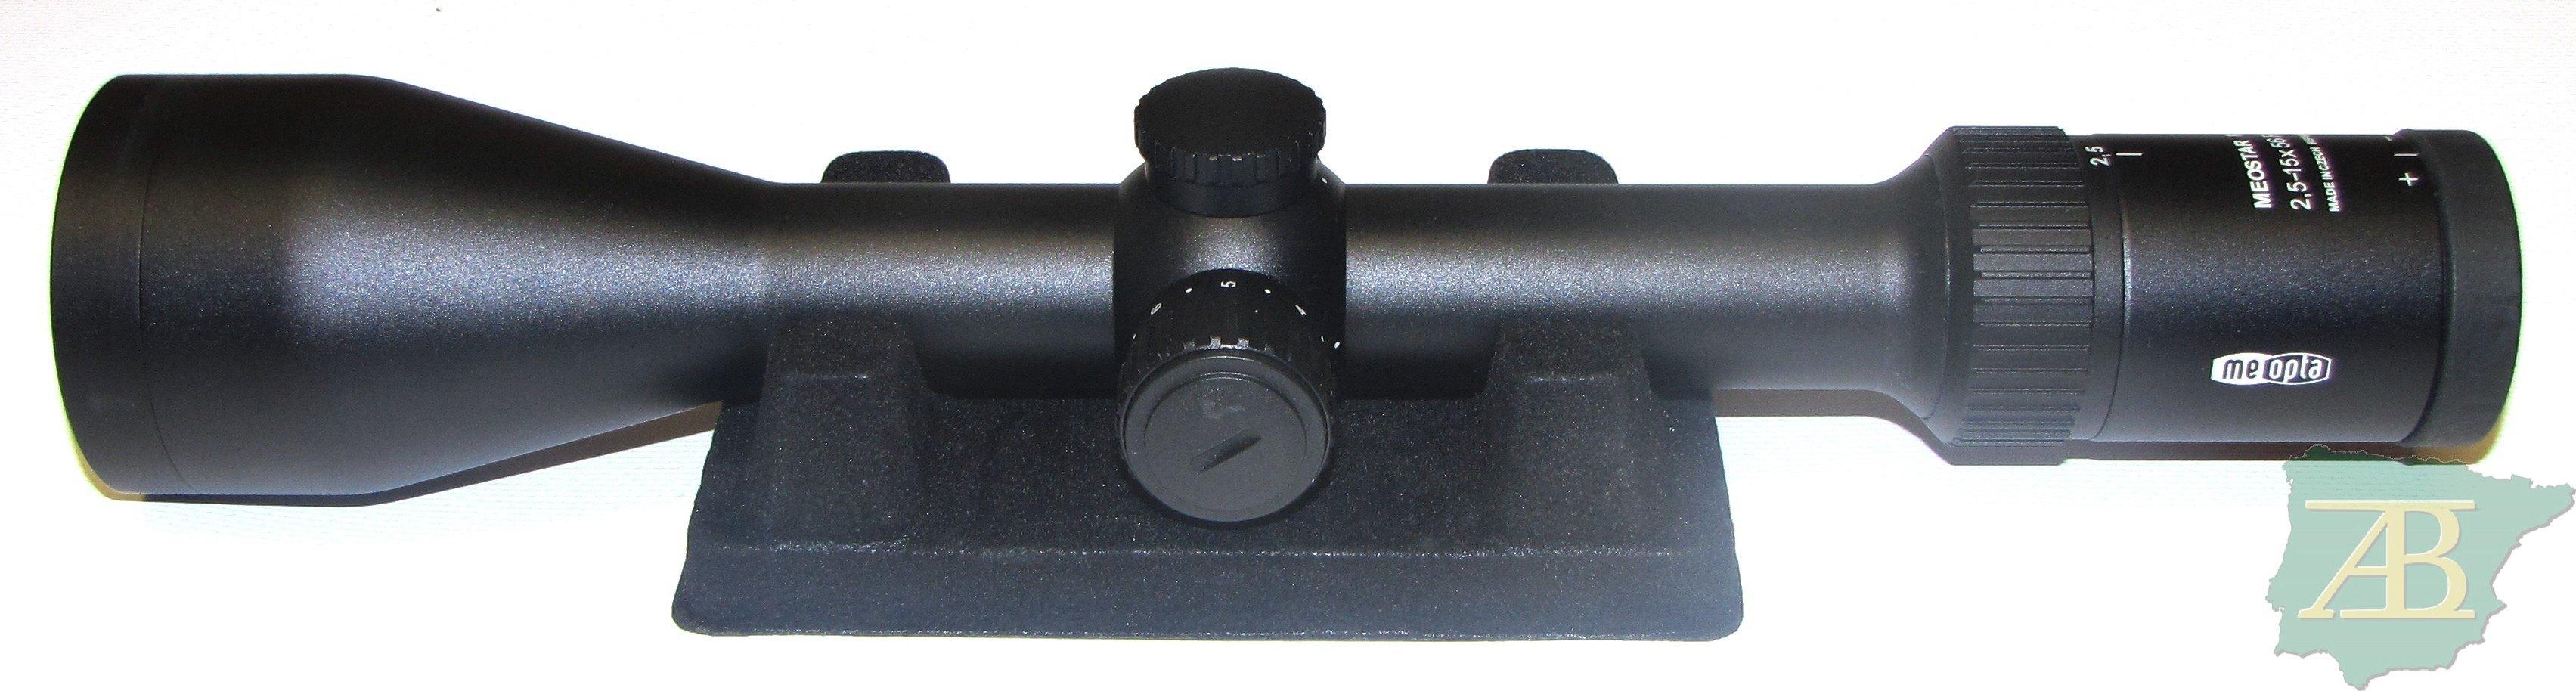 VISOR MEOPTA MEOSTAR R2 2.5-15X56 RD